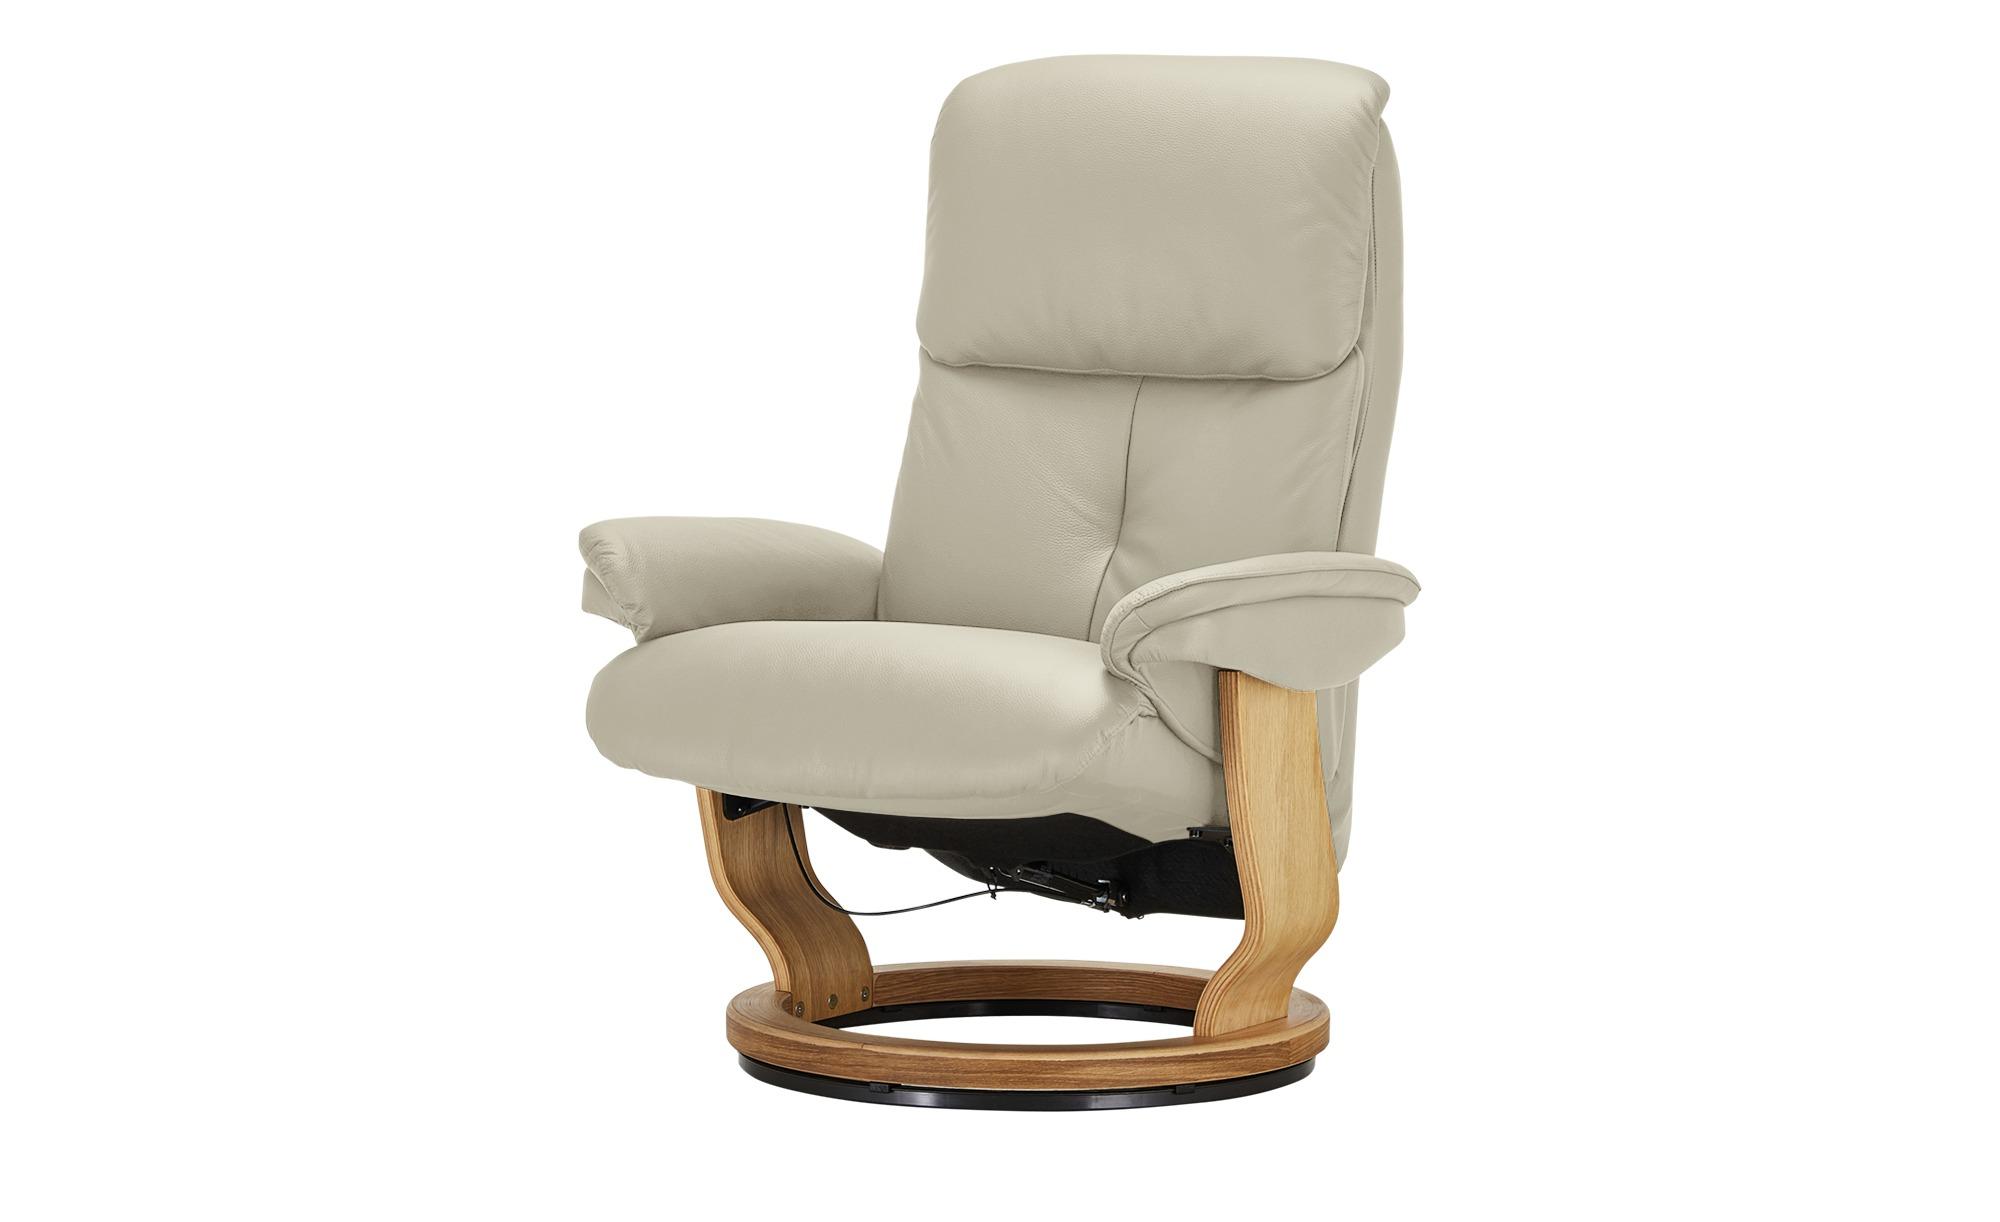 Relaxsessel  Farso ¦ creme ¦ Maße (cm): B: 85 H: 114 T: 92 Polstermöbel > Sessel > Drehsessel - Höffner